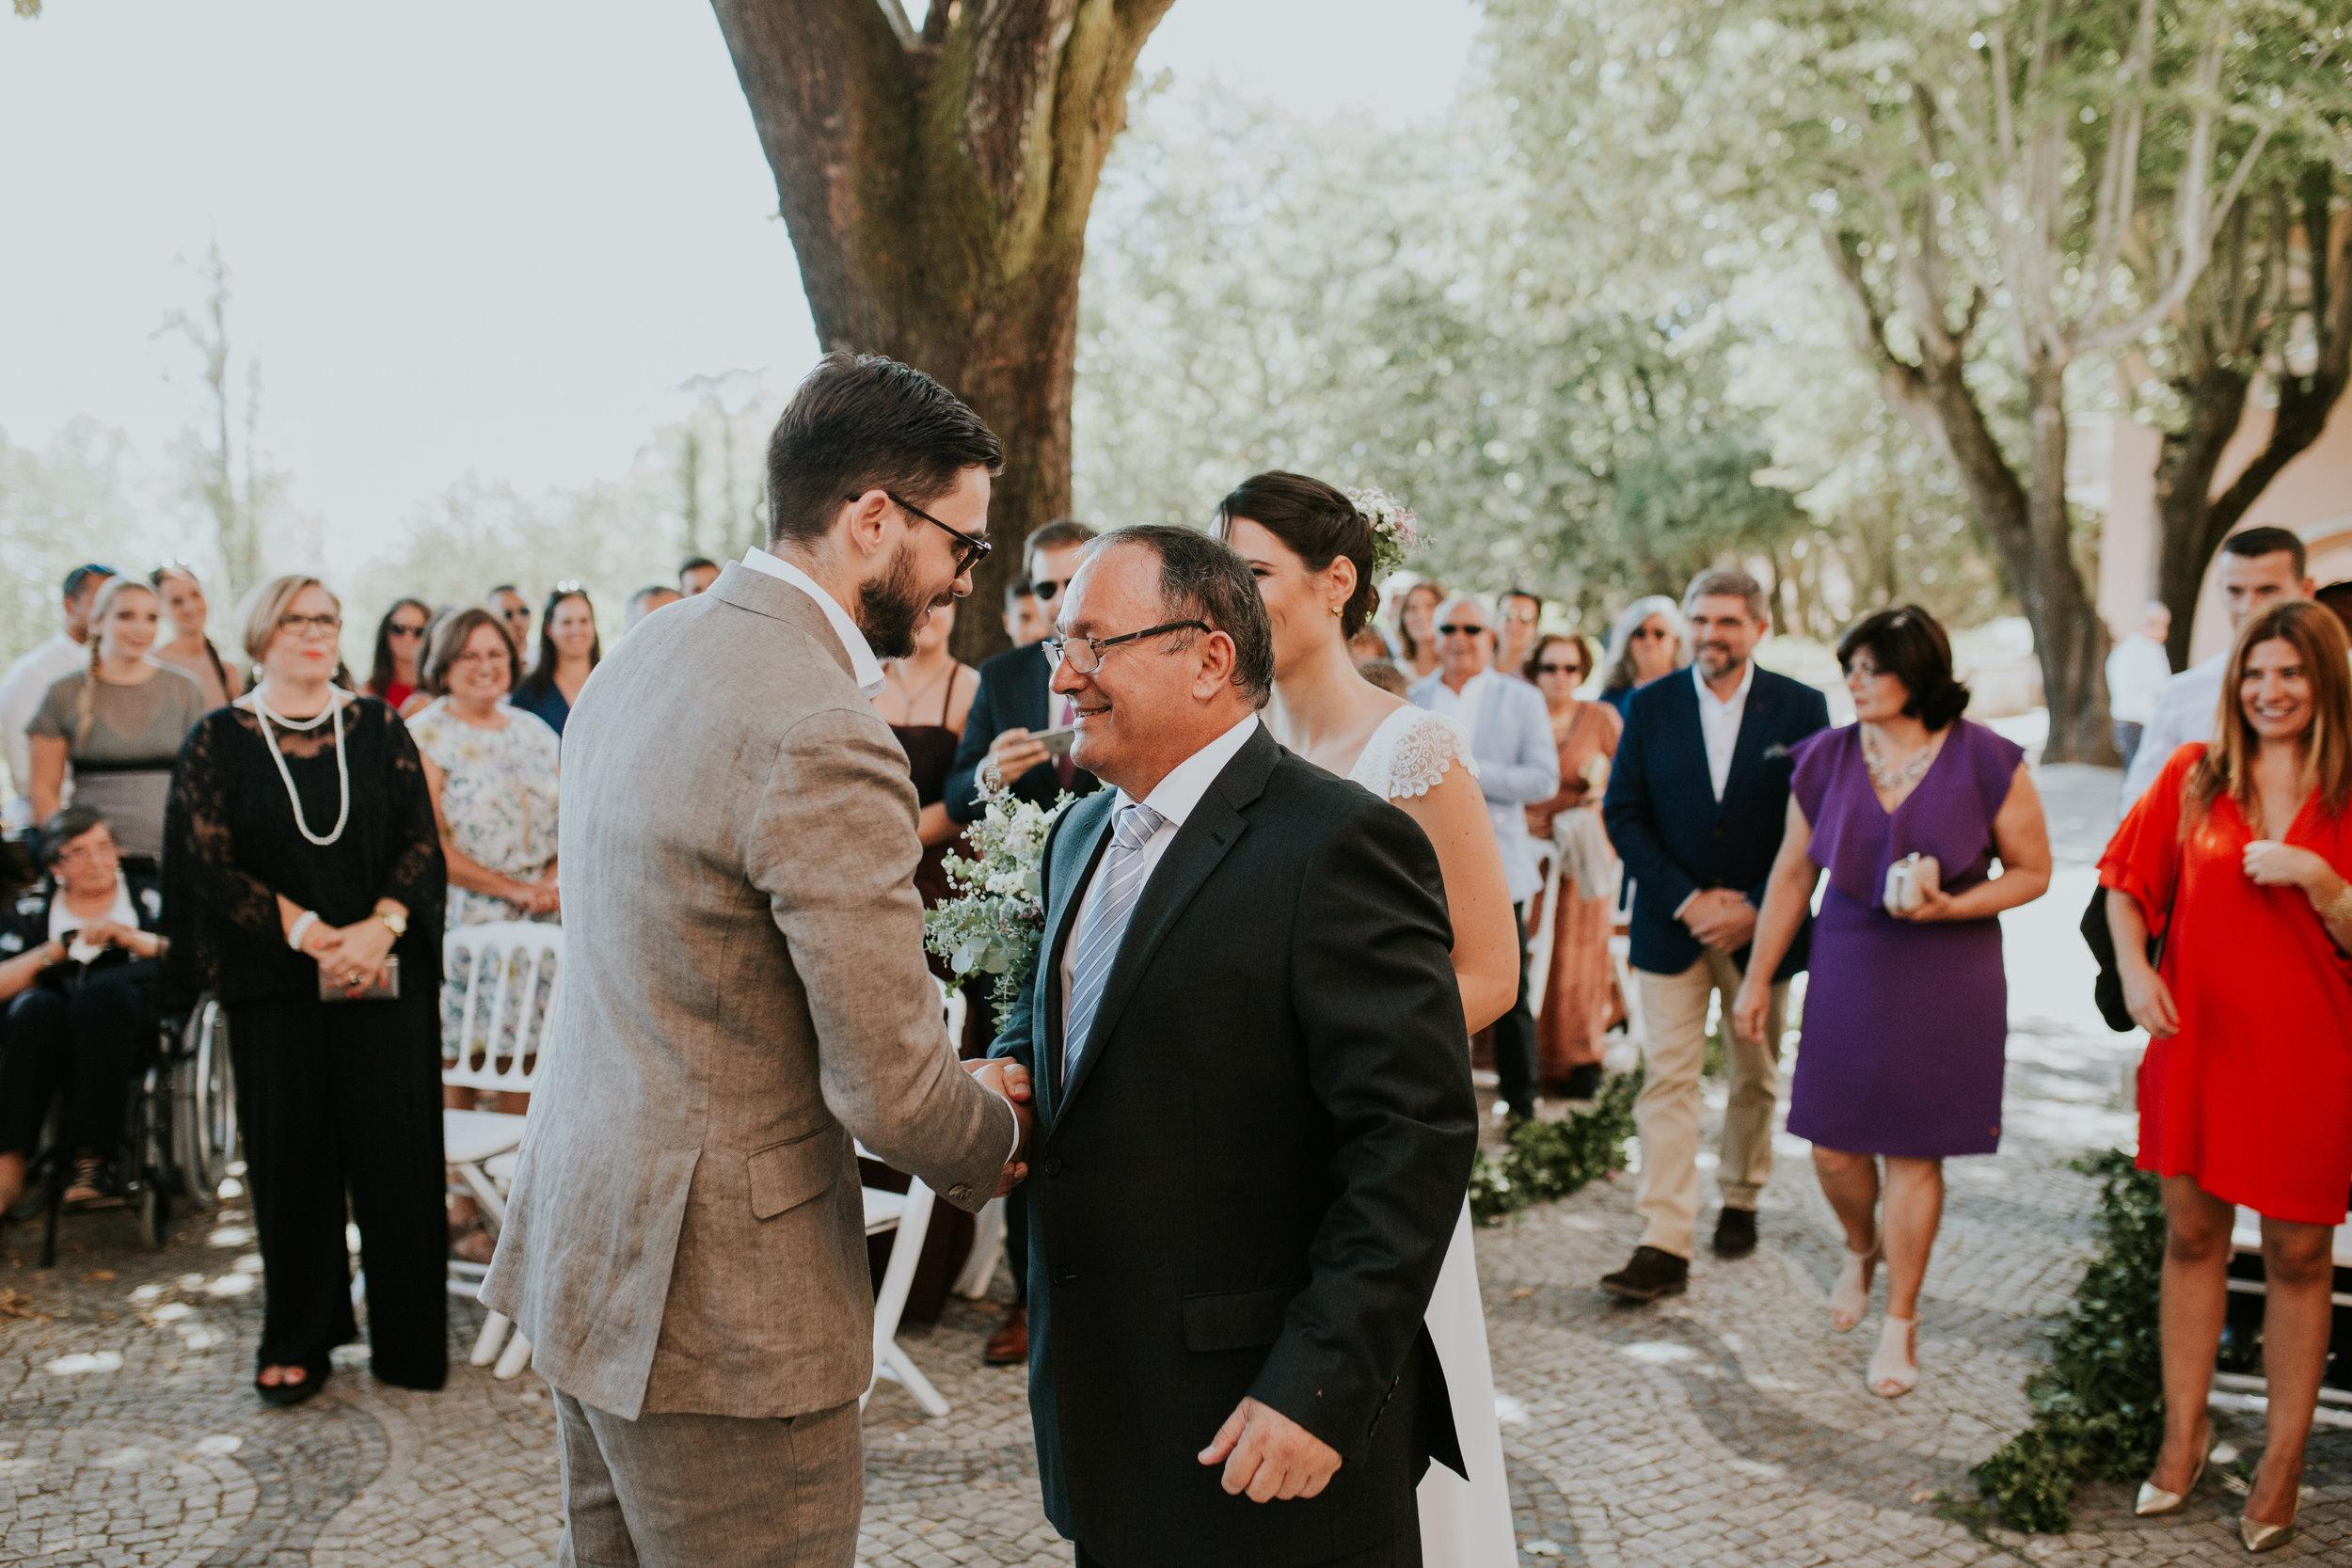 J&P 219_ 02 setembro 2017 Wedding day_.jpg